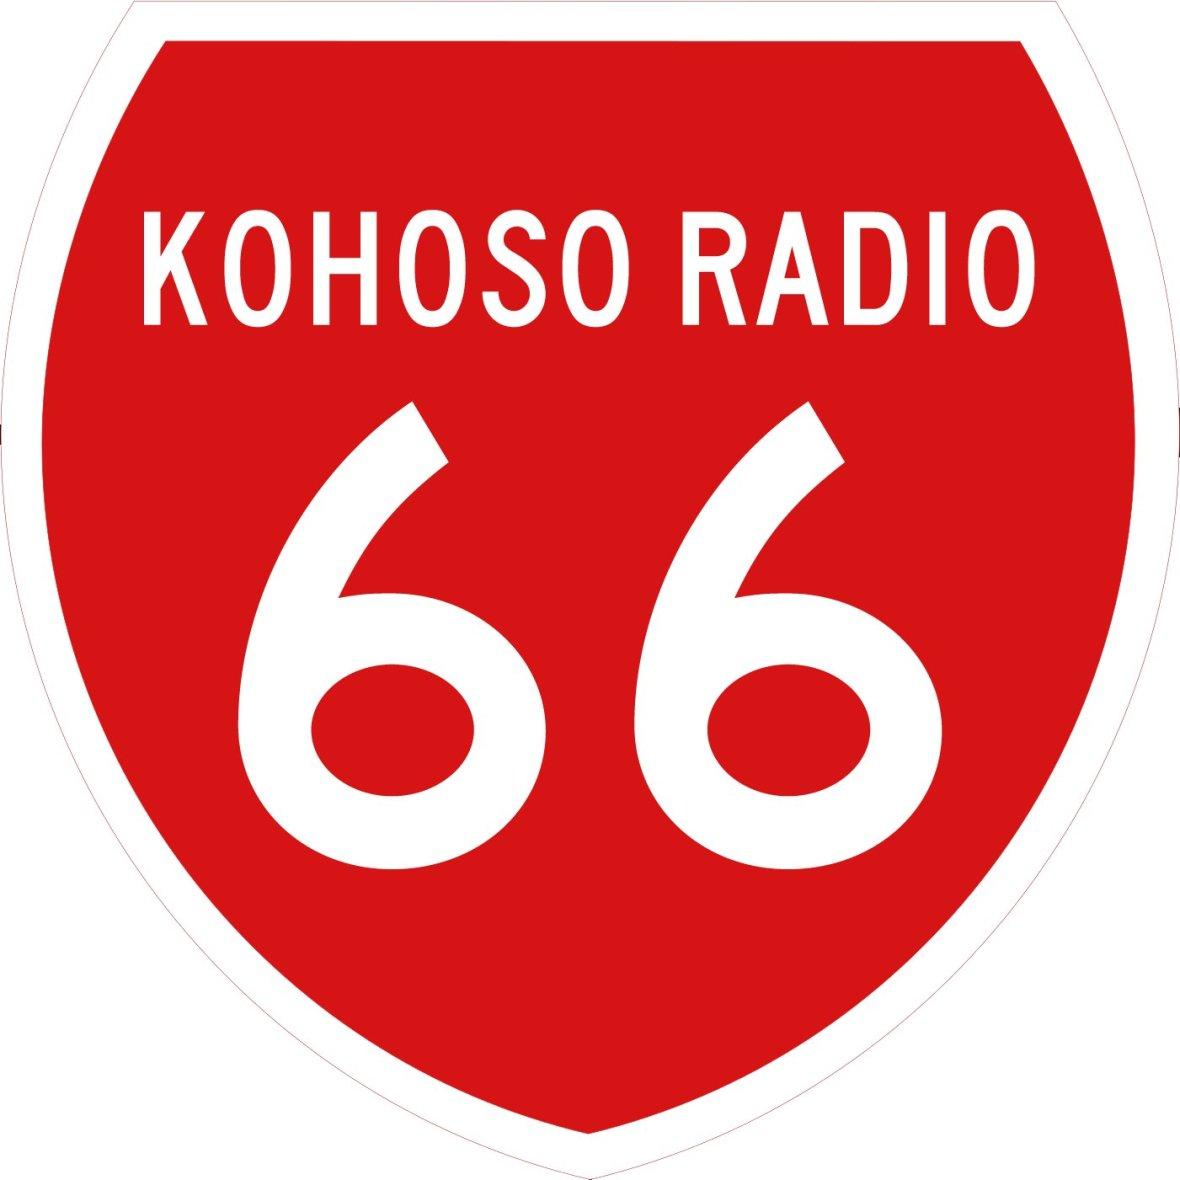 The New Zealand version of the KoHoSo Radio 66 shield